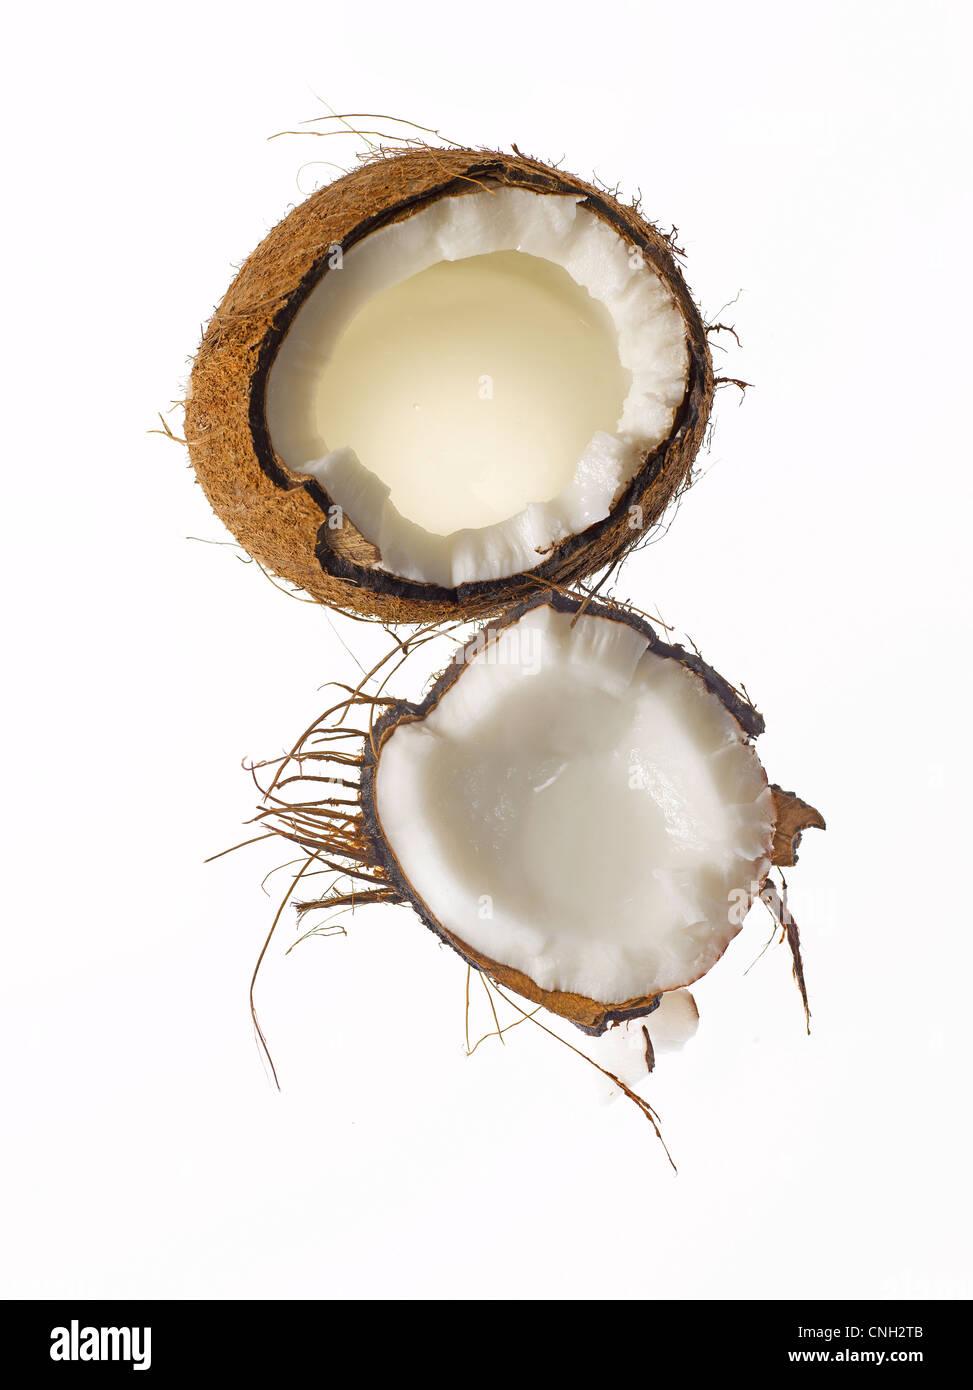 Cáscara de coco fresca cruda cortó abierto Imagen De Stock